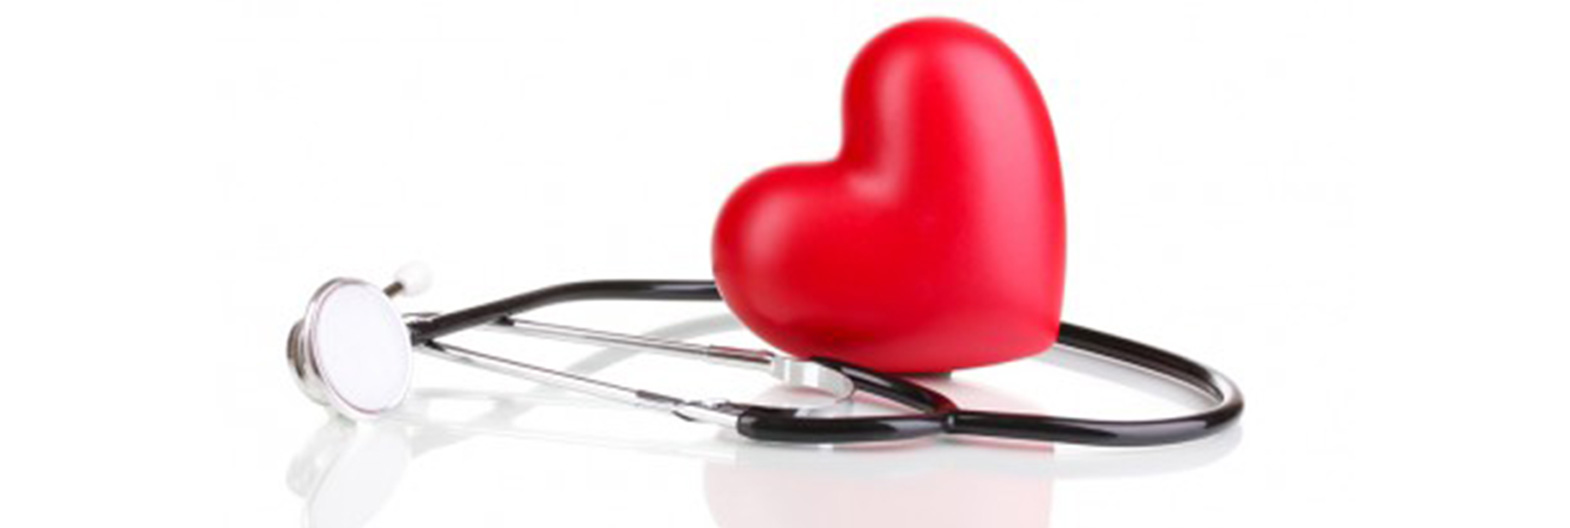 širdies sveikatos papildas hipertenzija kaip hipertenzijos simptomas